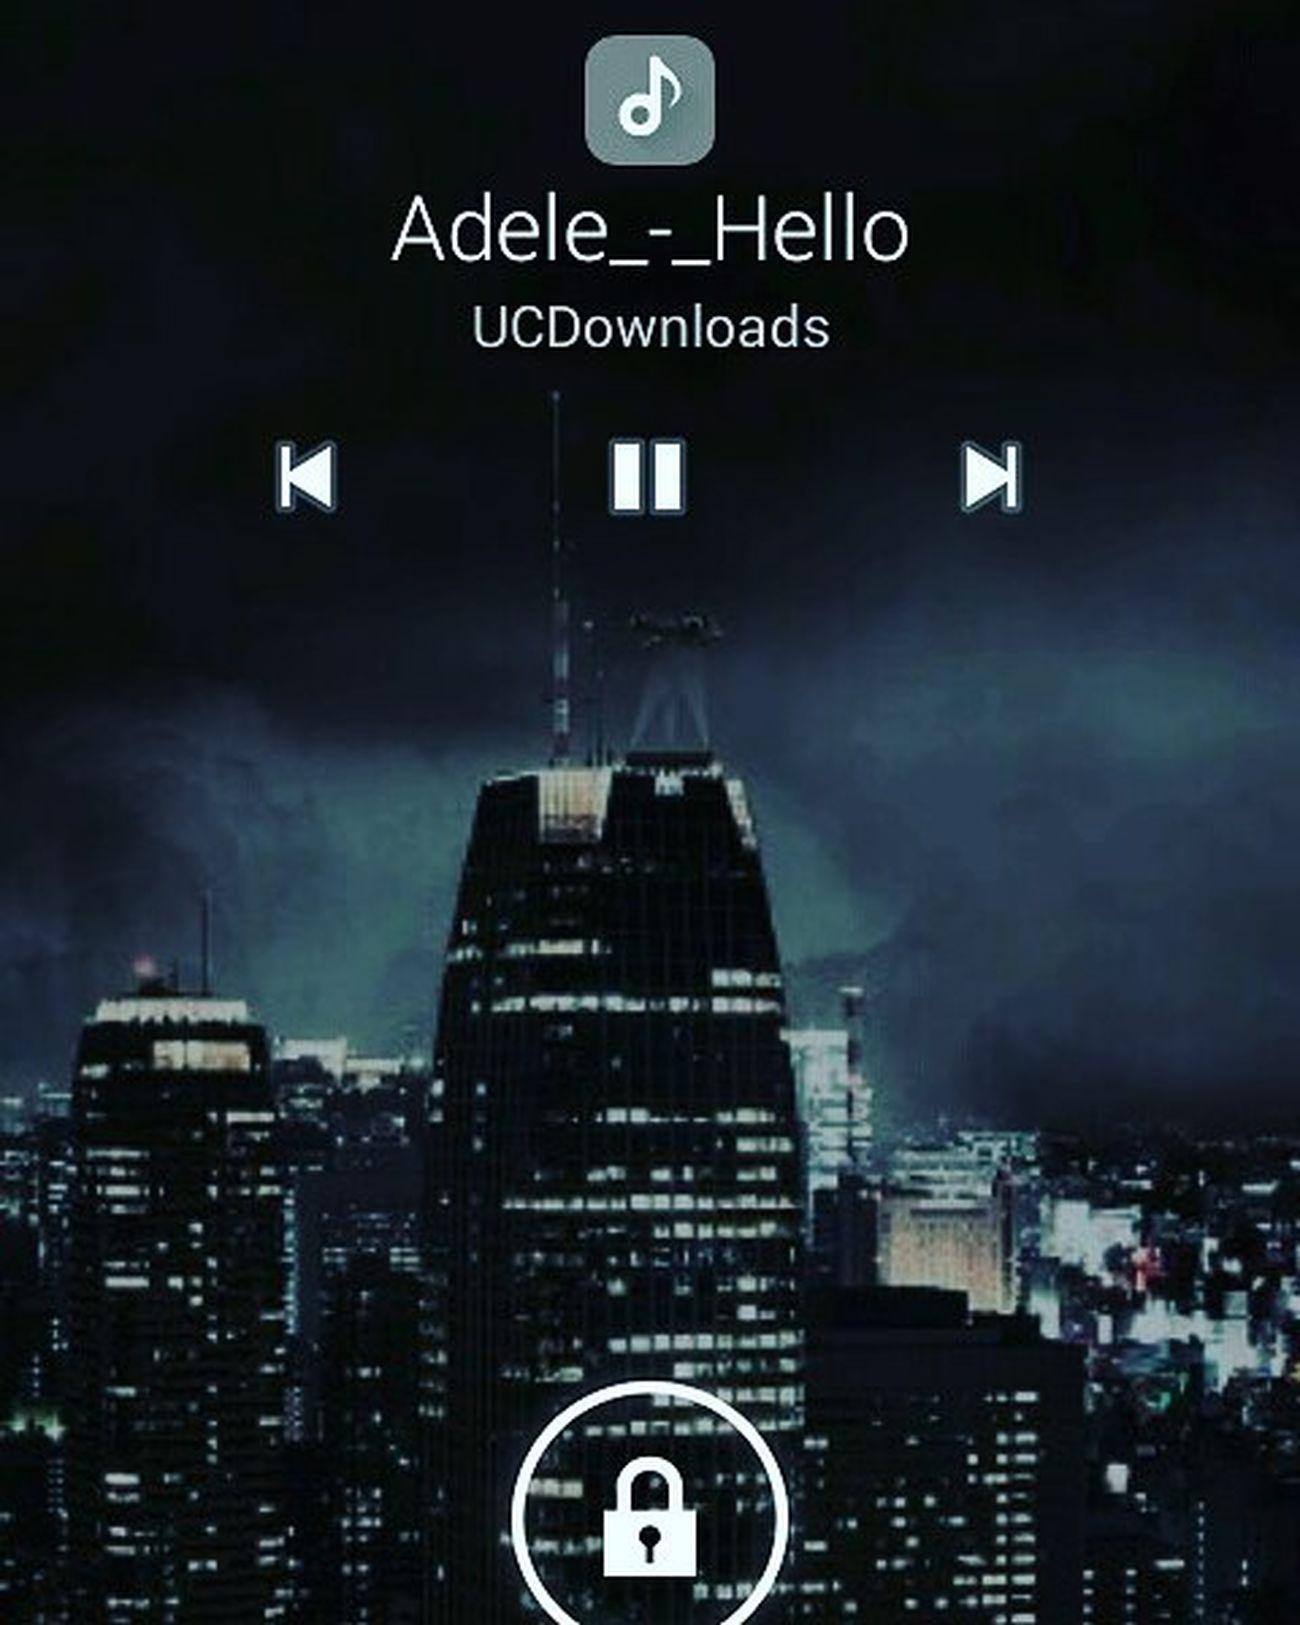 Adele Hello Whatacomeback Onrepeat Heartwrenching Billboard Hit Justfeelit